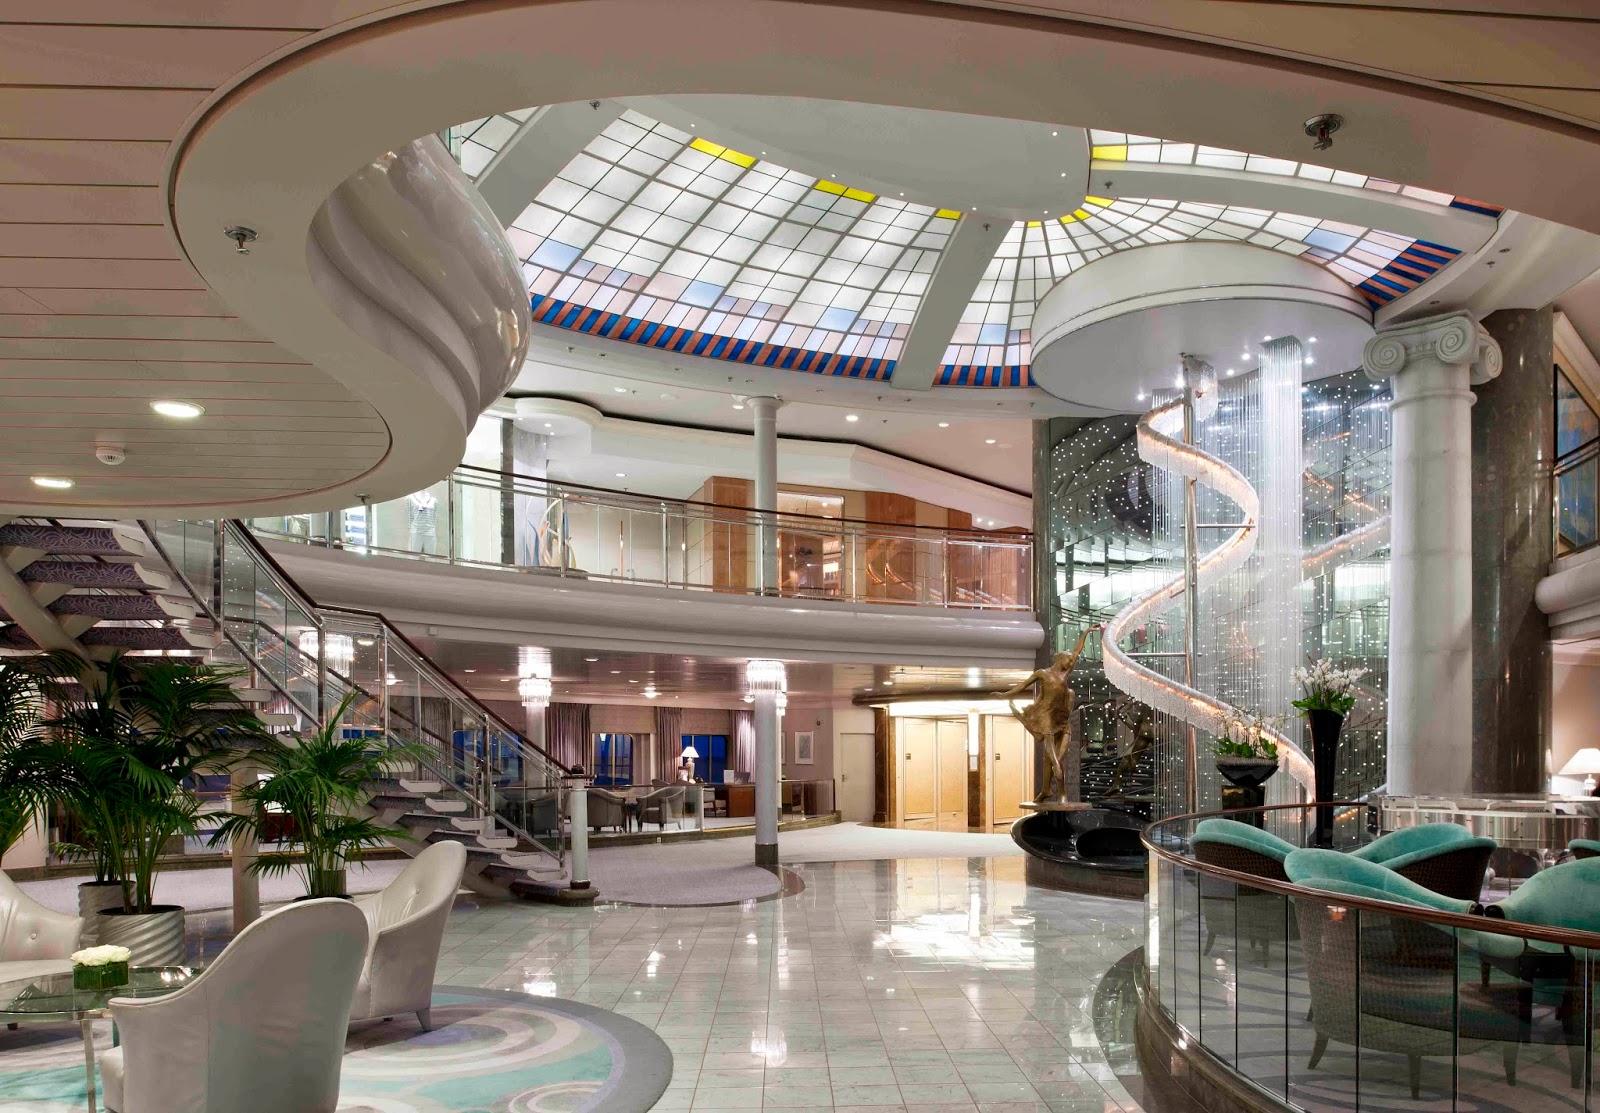 Crystal Symphony - Atrium Entry-300 dpi emailable.jpg